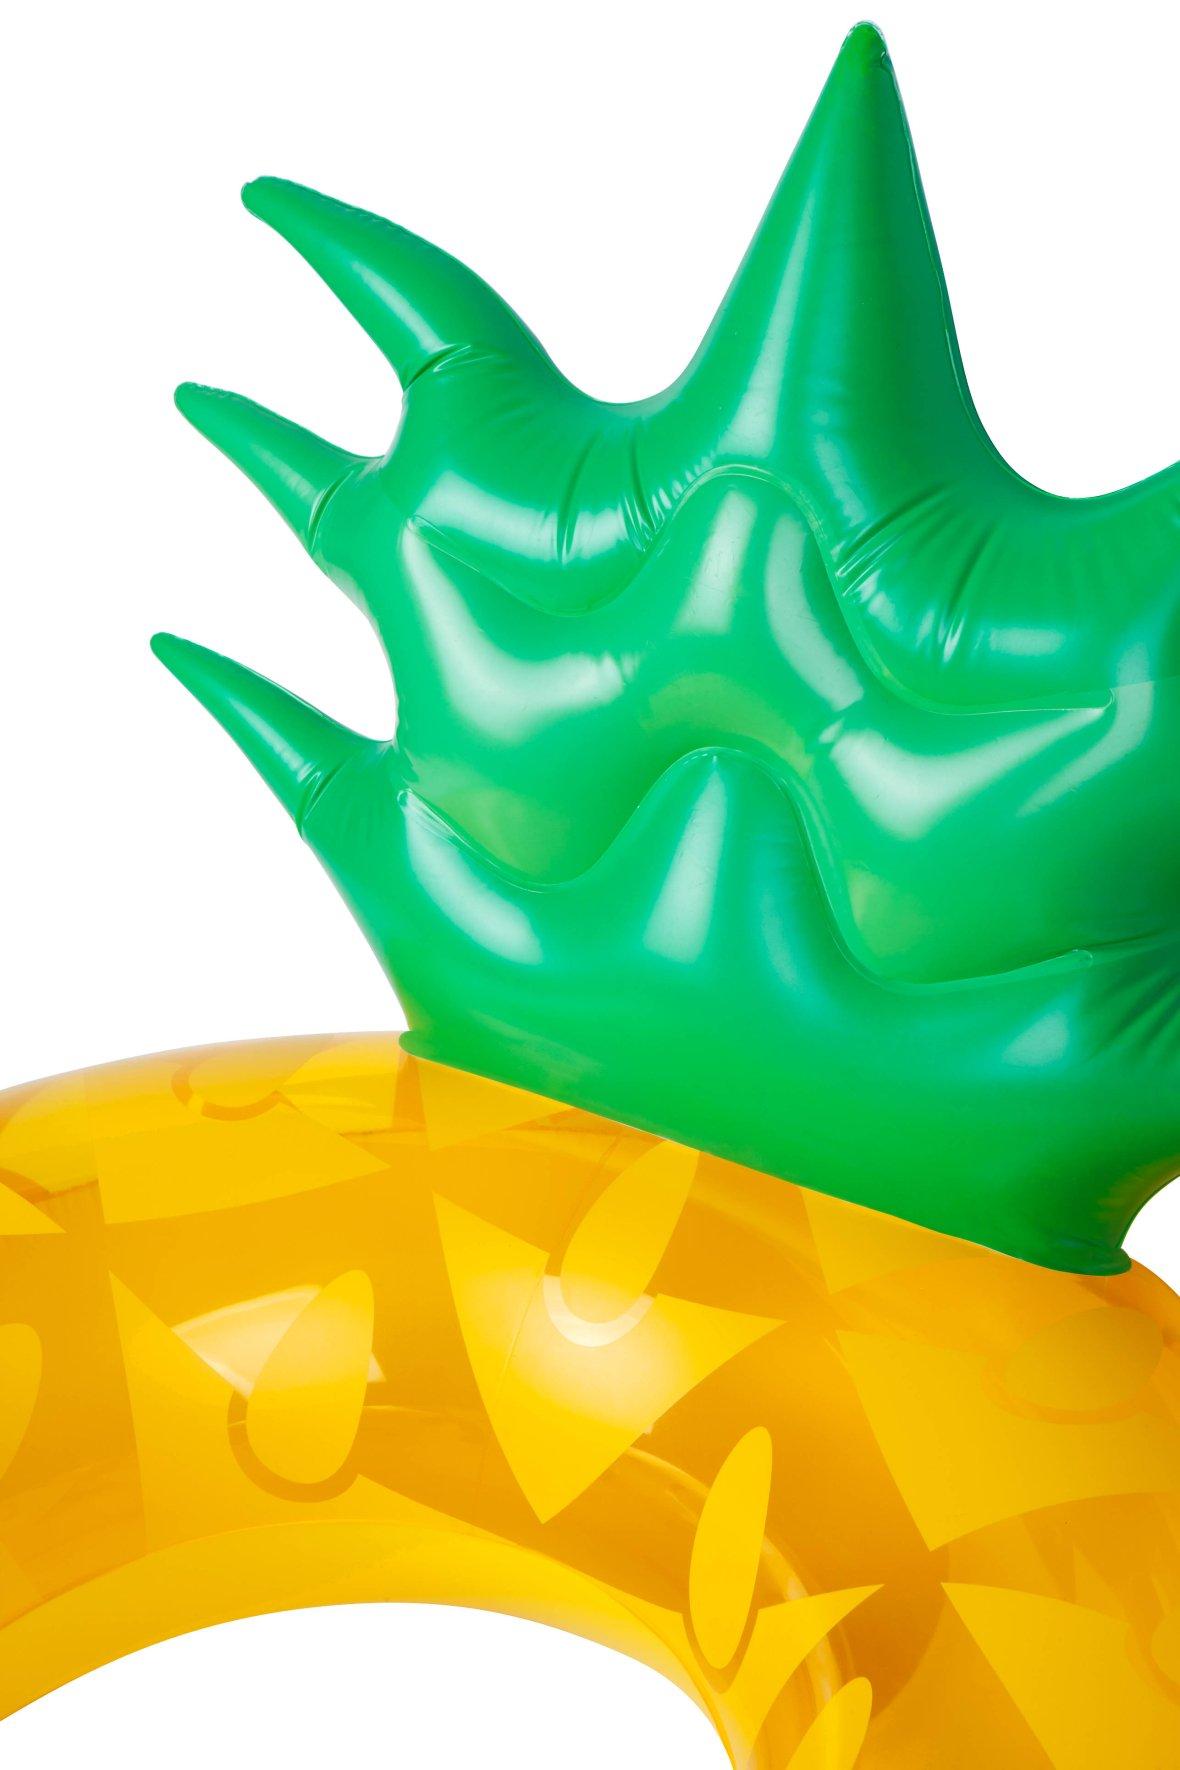 Bouée ananas | Bouée